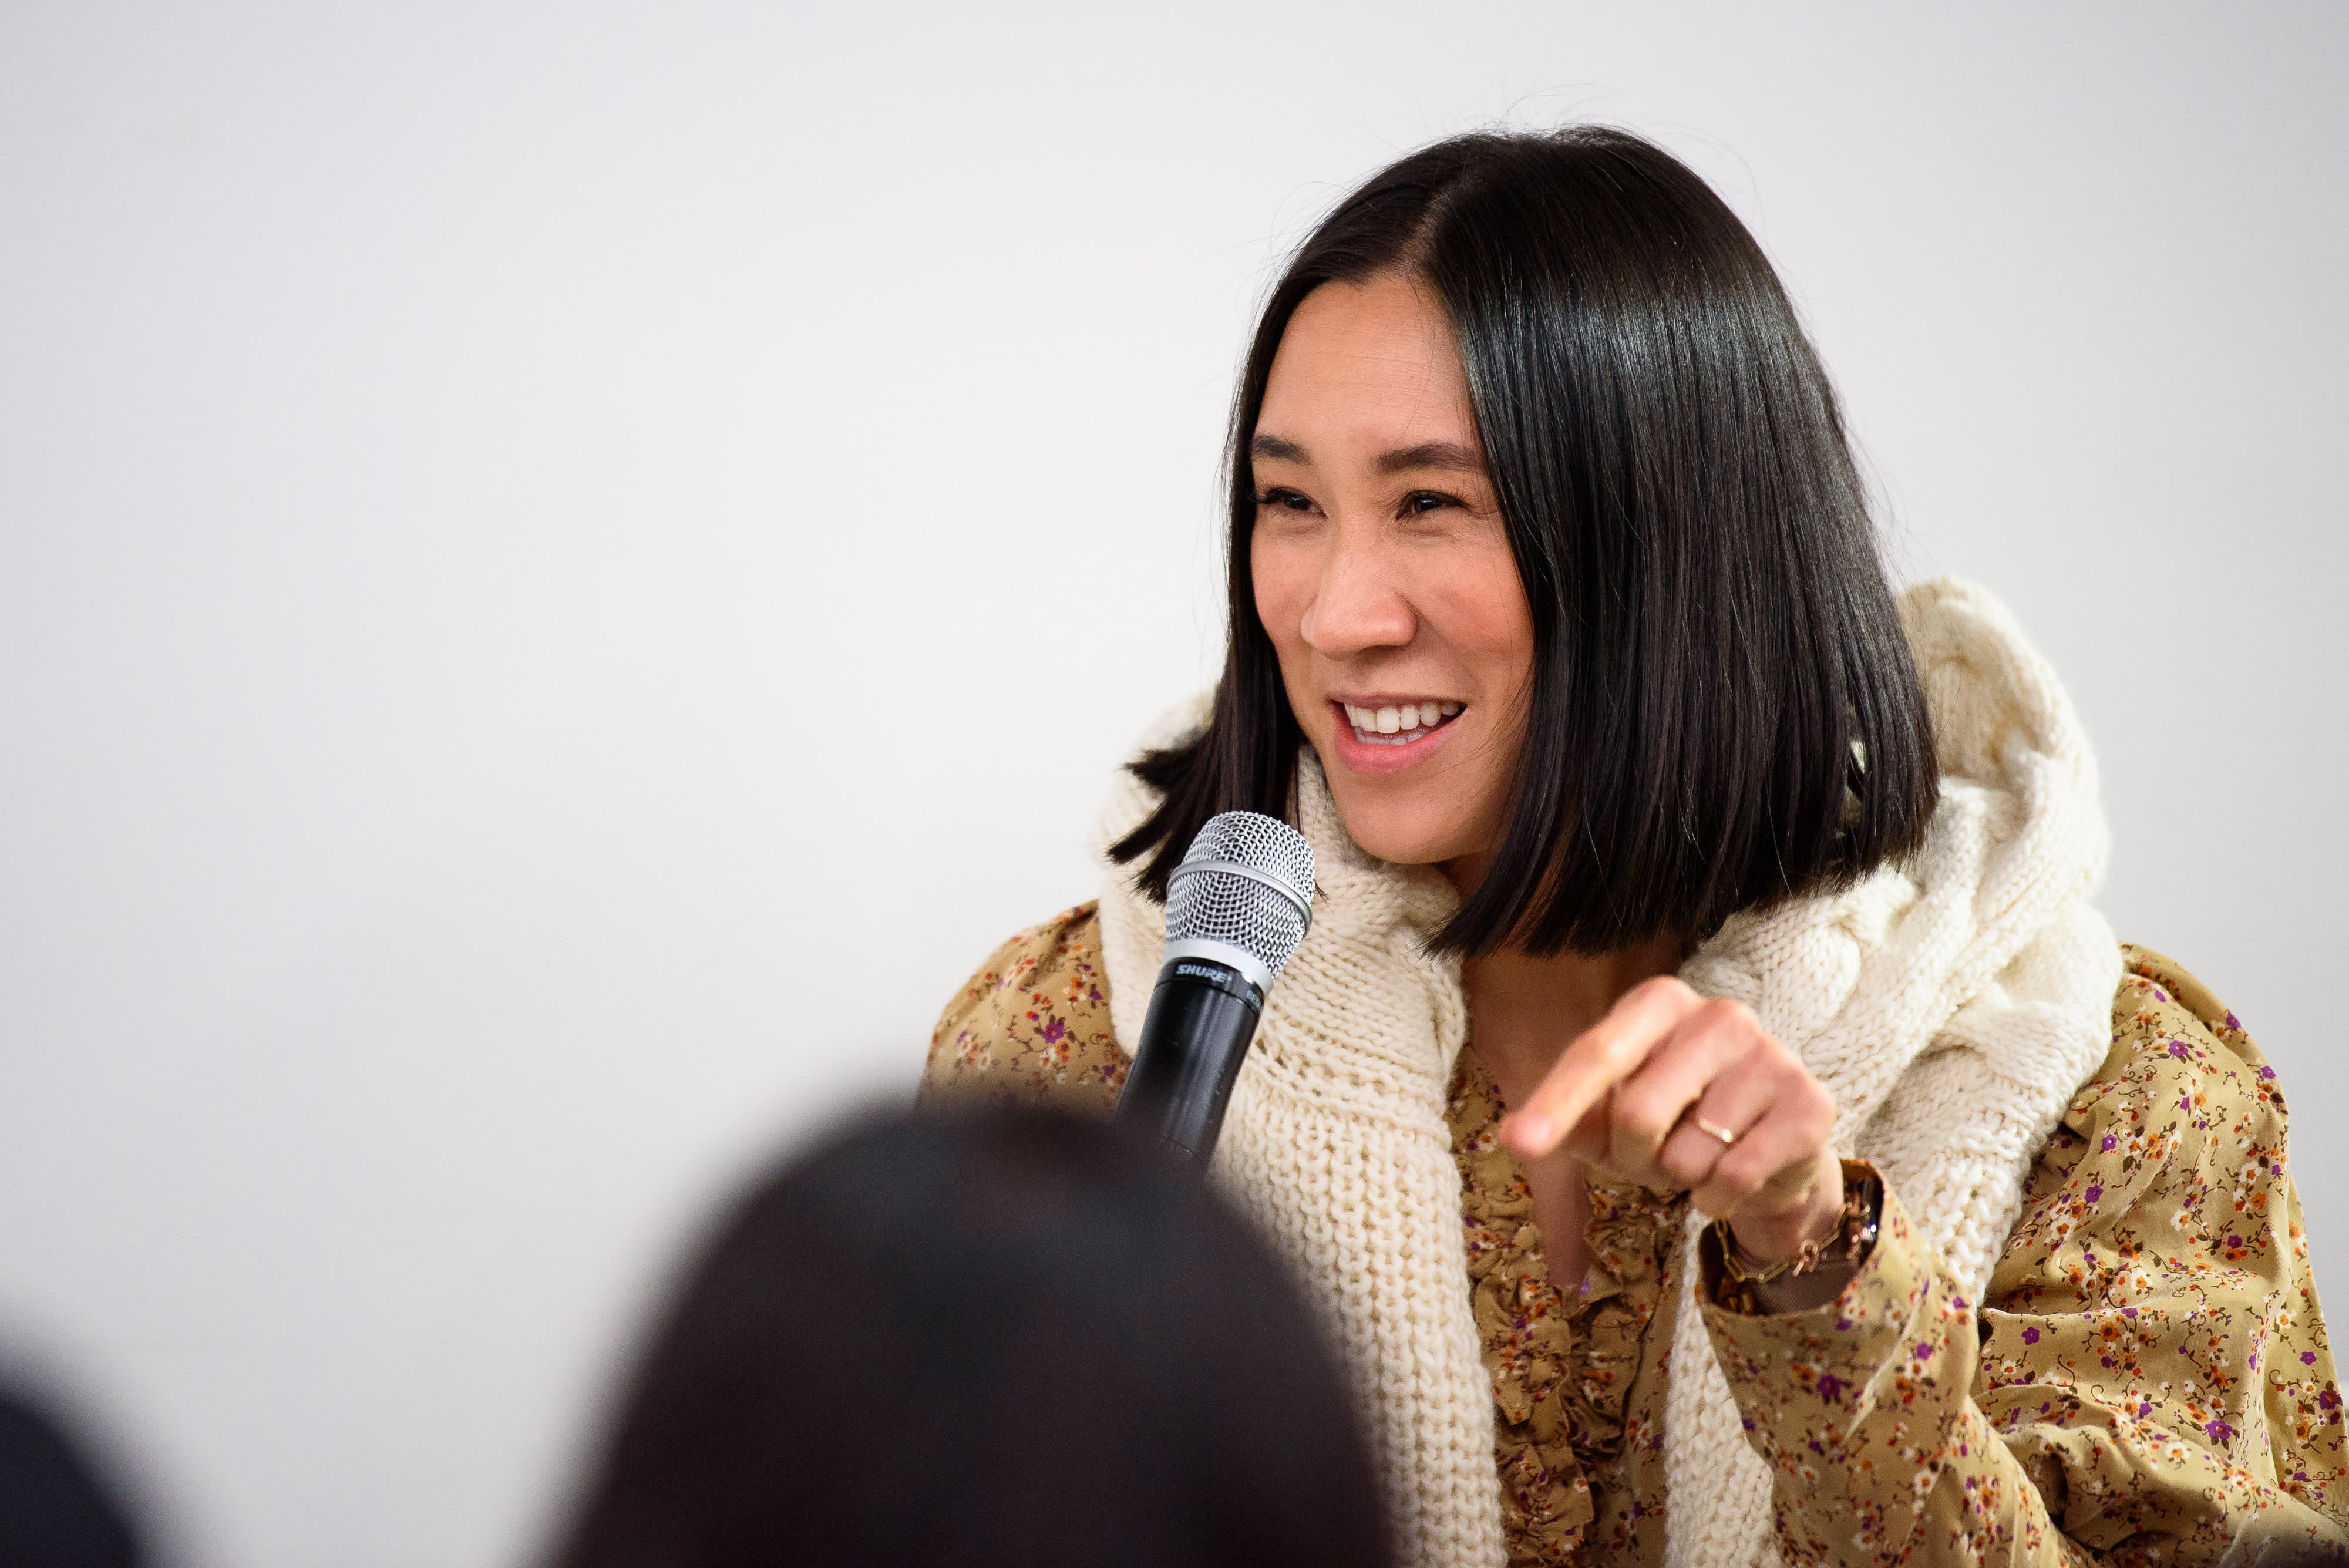 www.cnbc.com: Instagram's Eva Chen talks #StopAsianHate with leaders in media, film, advocacy